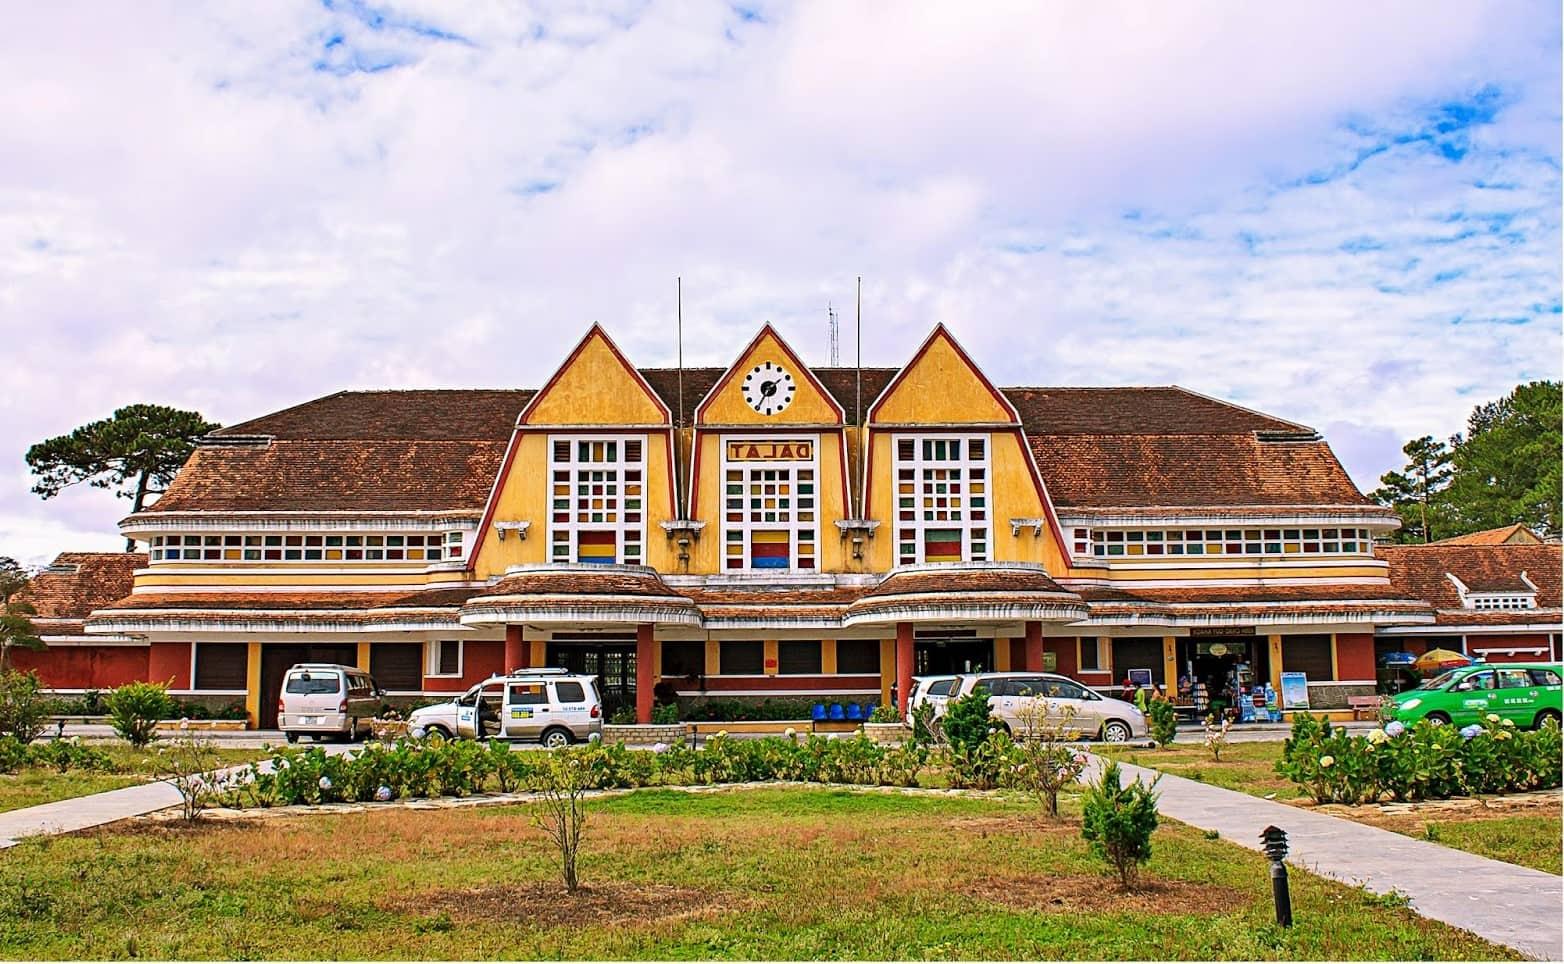 dalat old train station